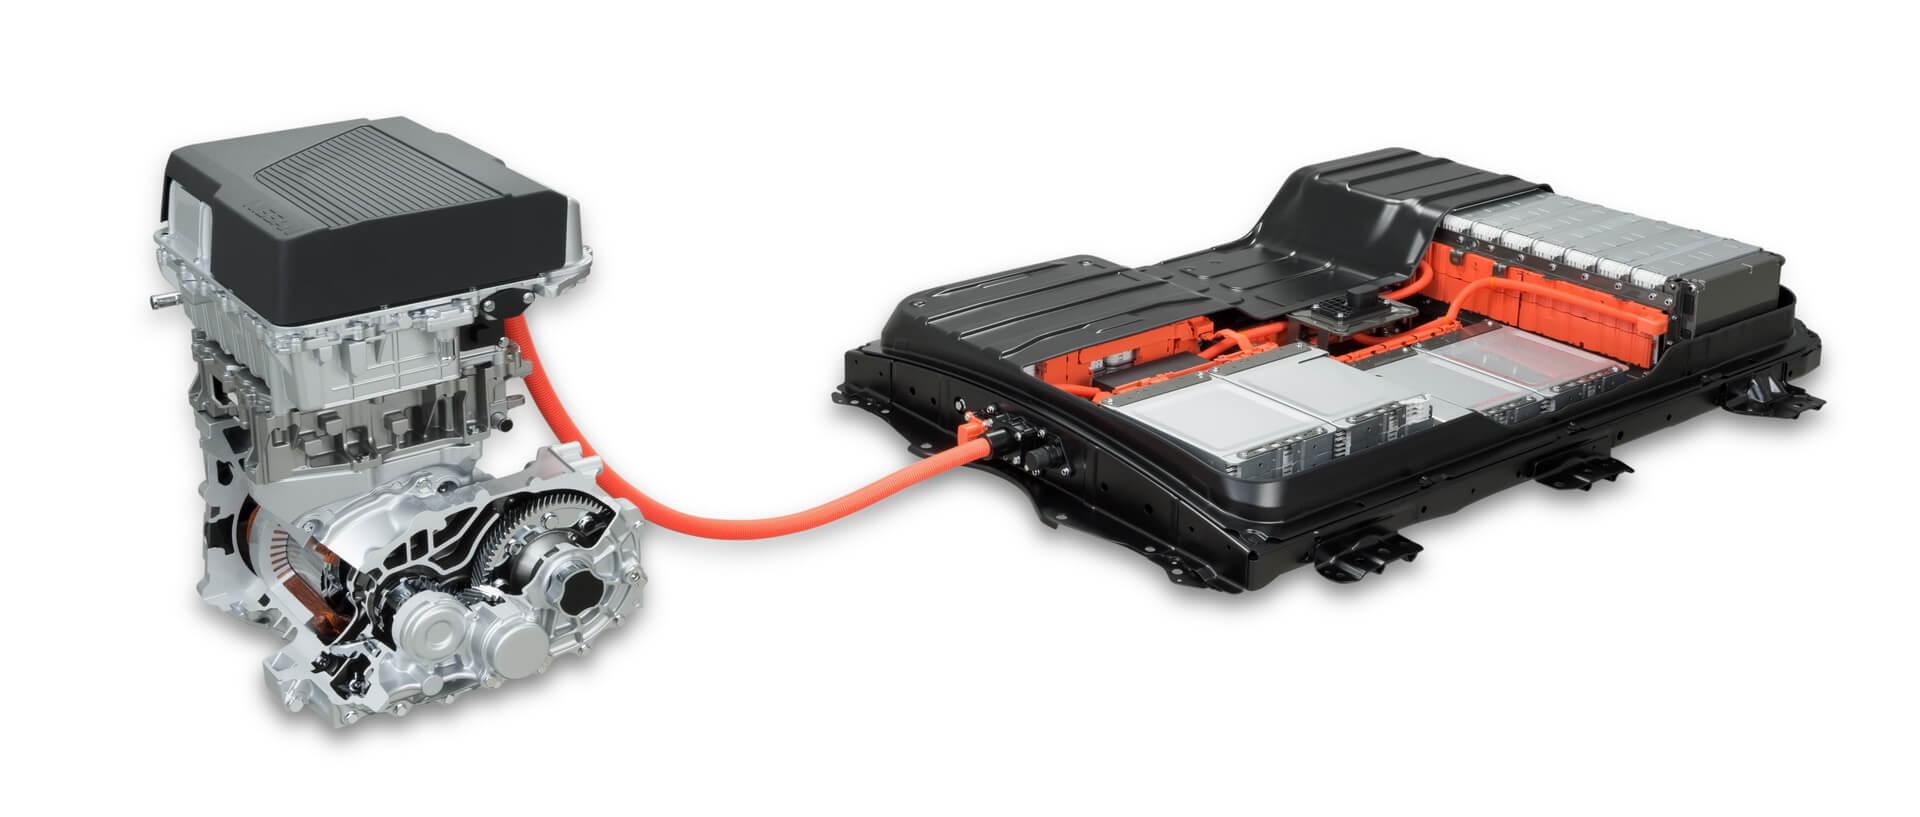 Електродвигун та акумулятор Nissan Leaf 2018